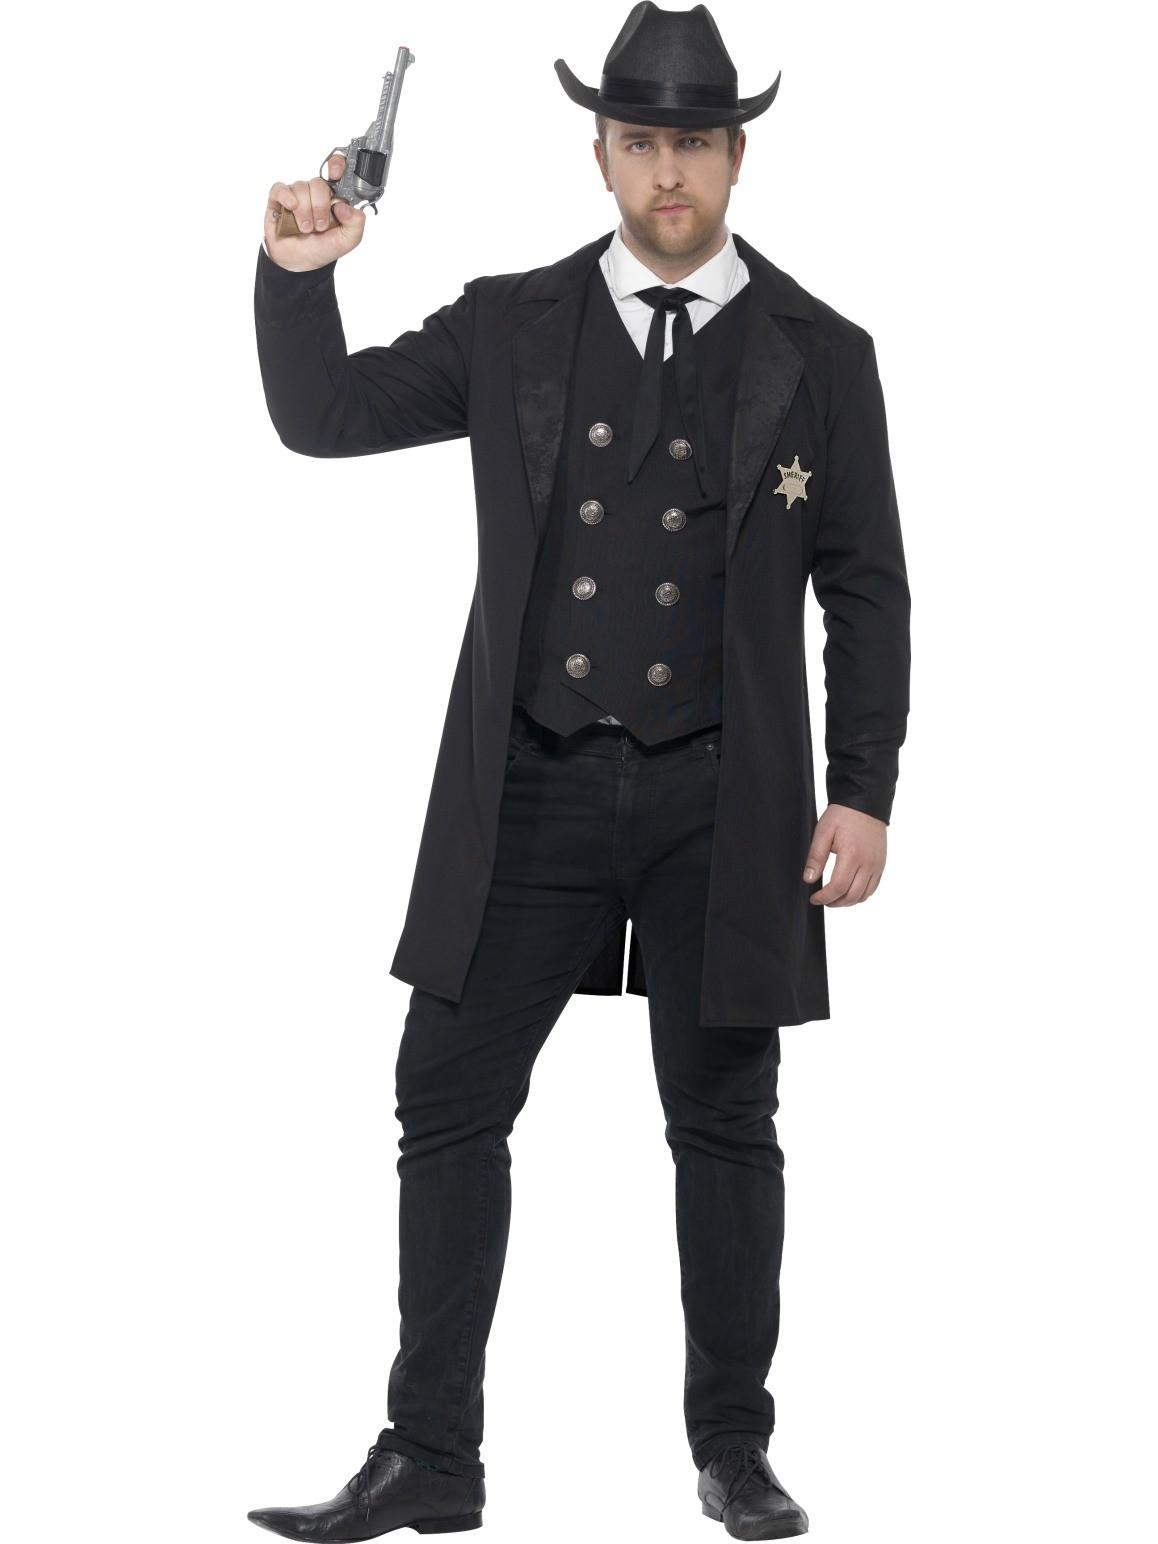 Maskeradkläder Vuxna - Sheriff Maskeraddräkt